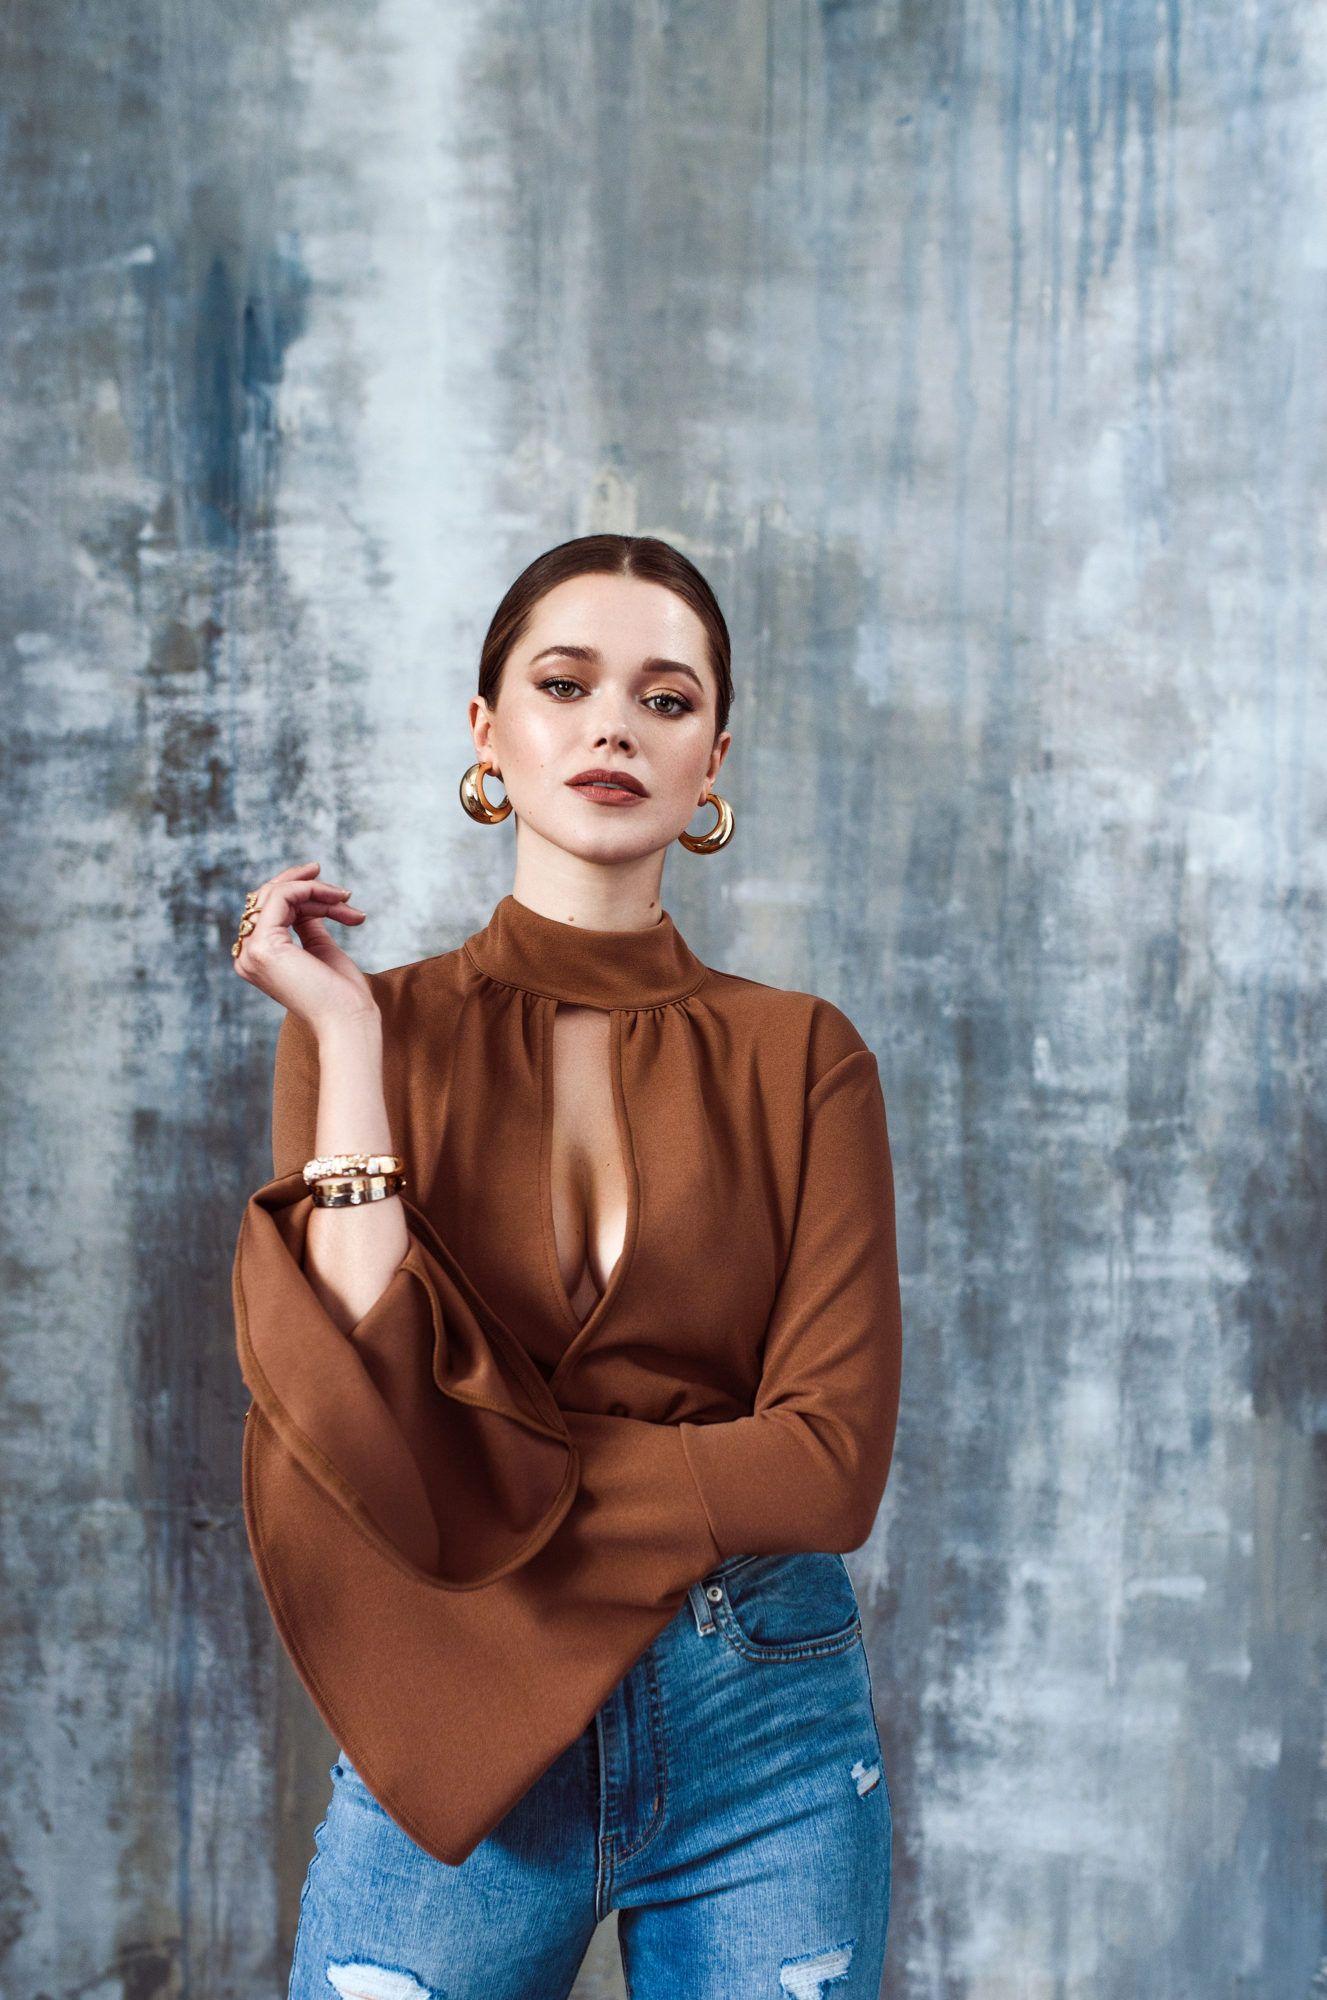 Valeria Lipovetsky on Life as an Influencer, Mothe